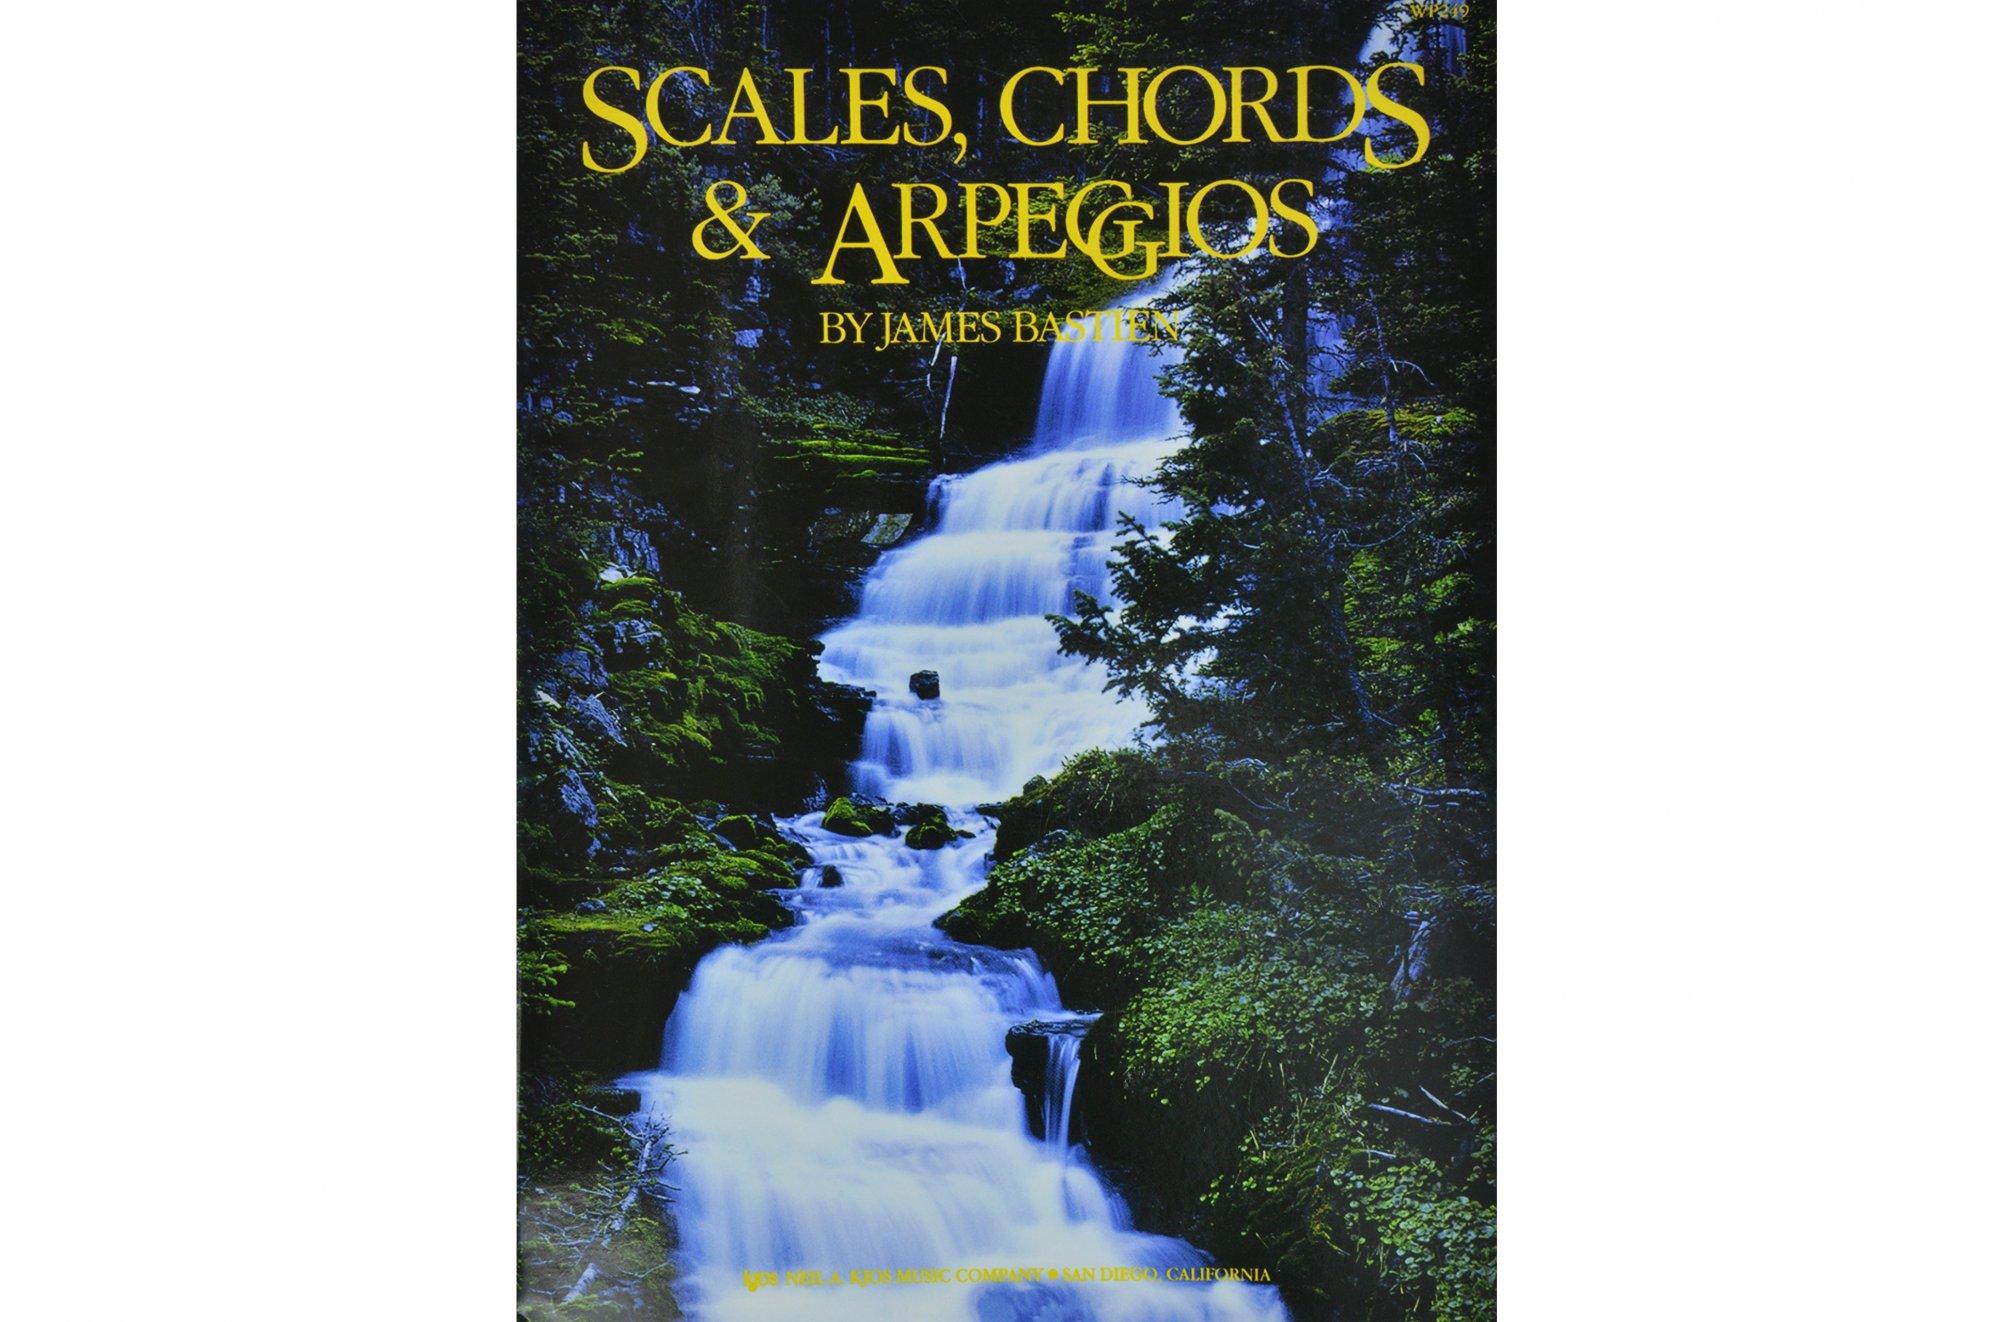 Bastien Scales Chords and Arpeggios